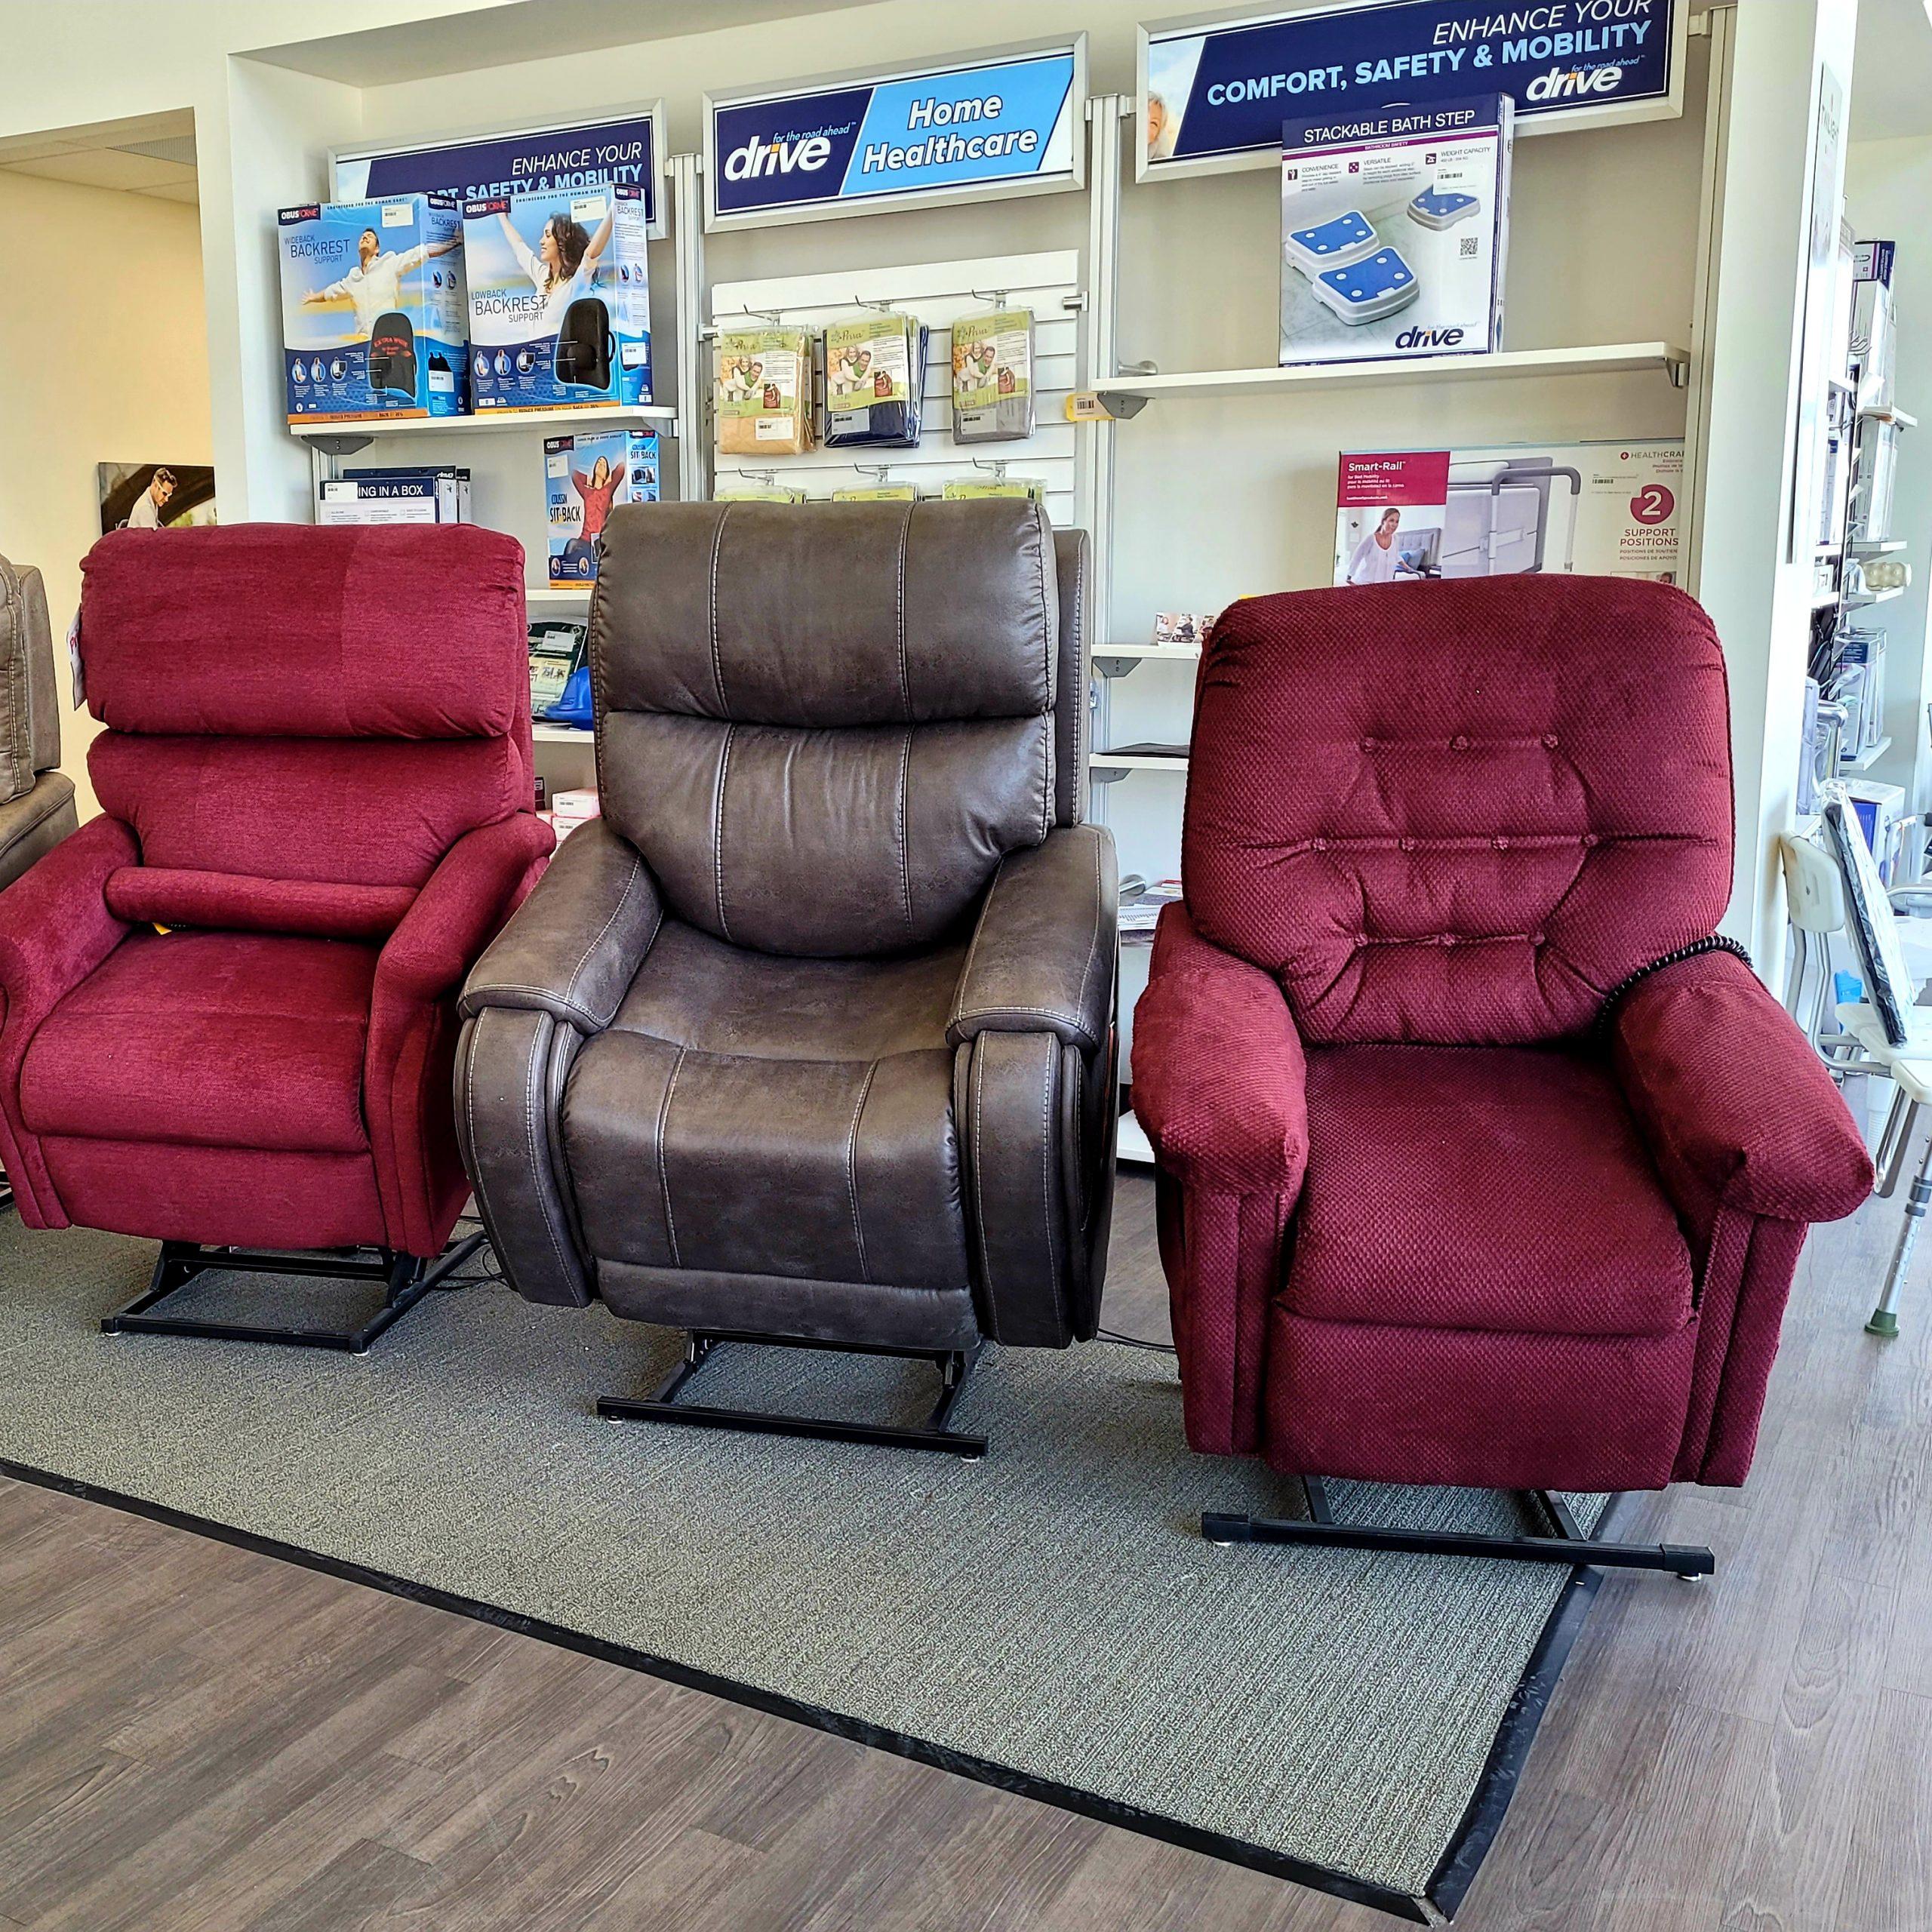 Barrie showroom - power lift recliners